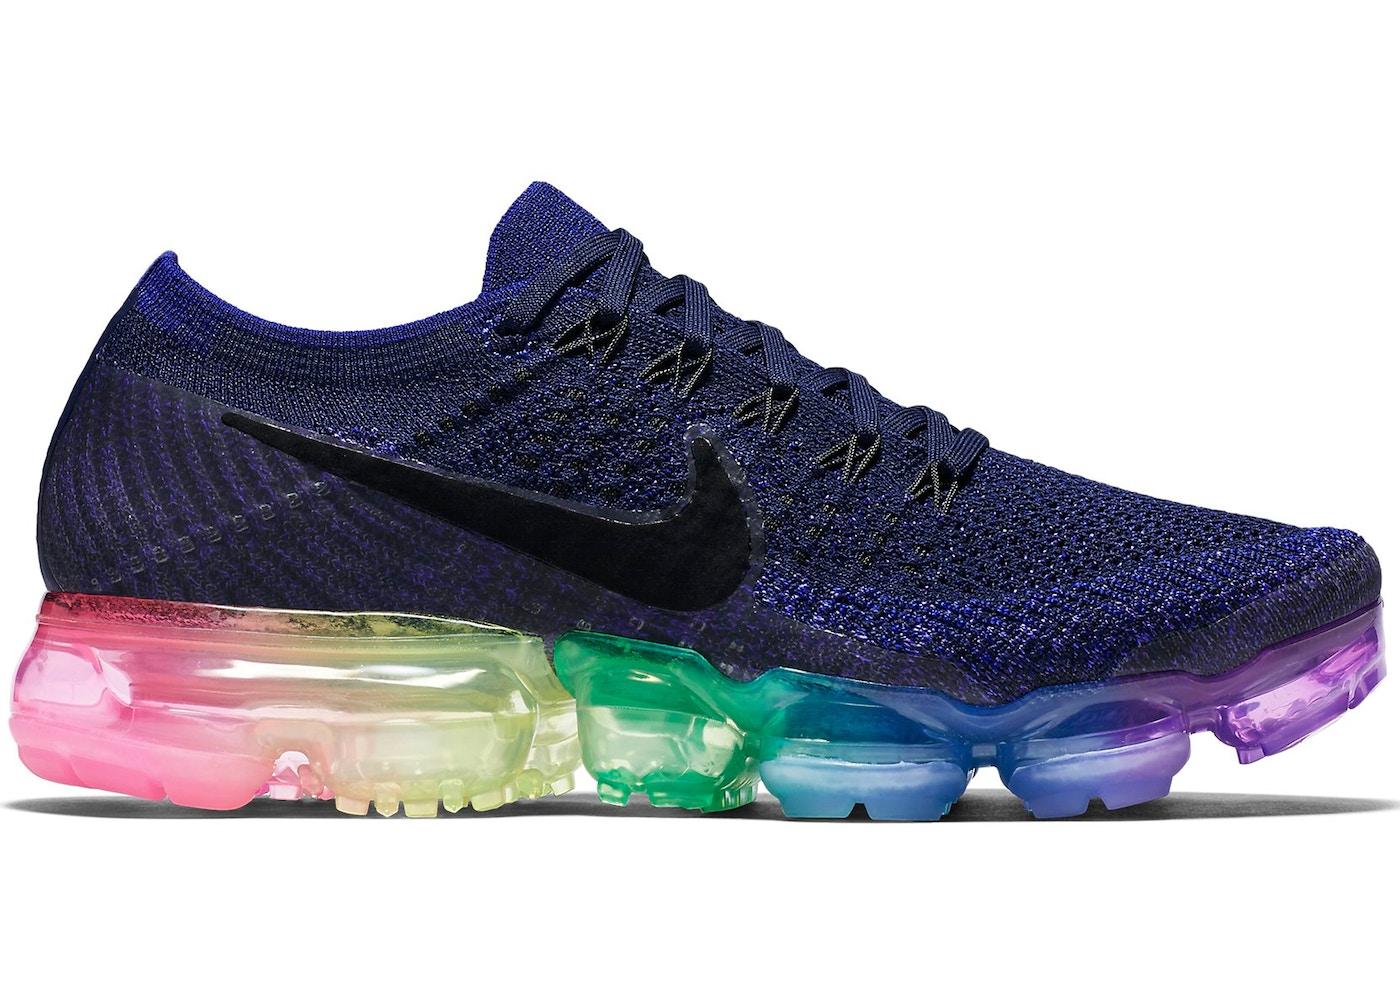 brand new 7c012 26df9 Nike Air Max VaporMax Shoes - Price Premium